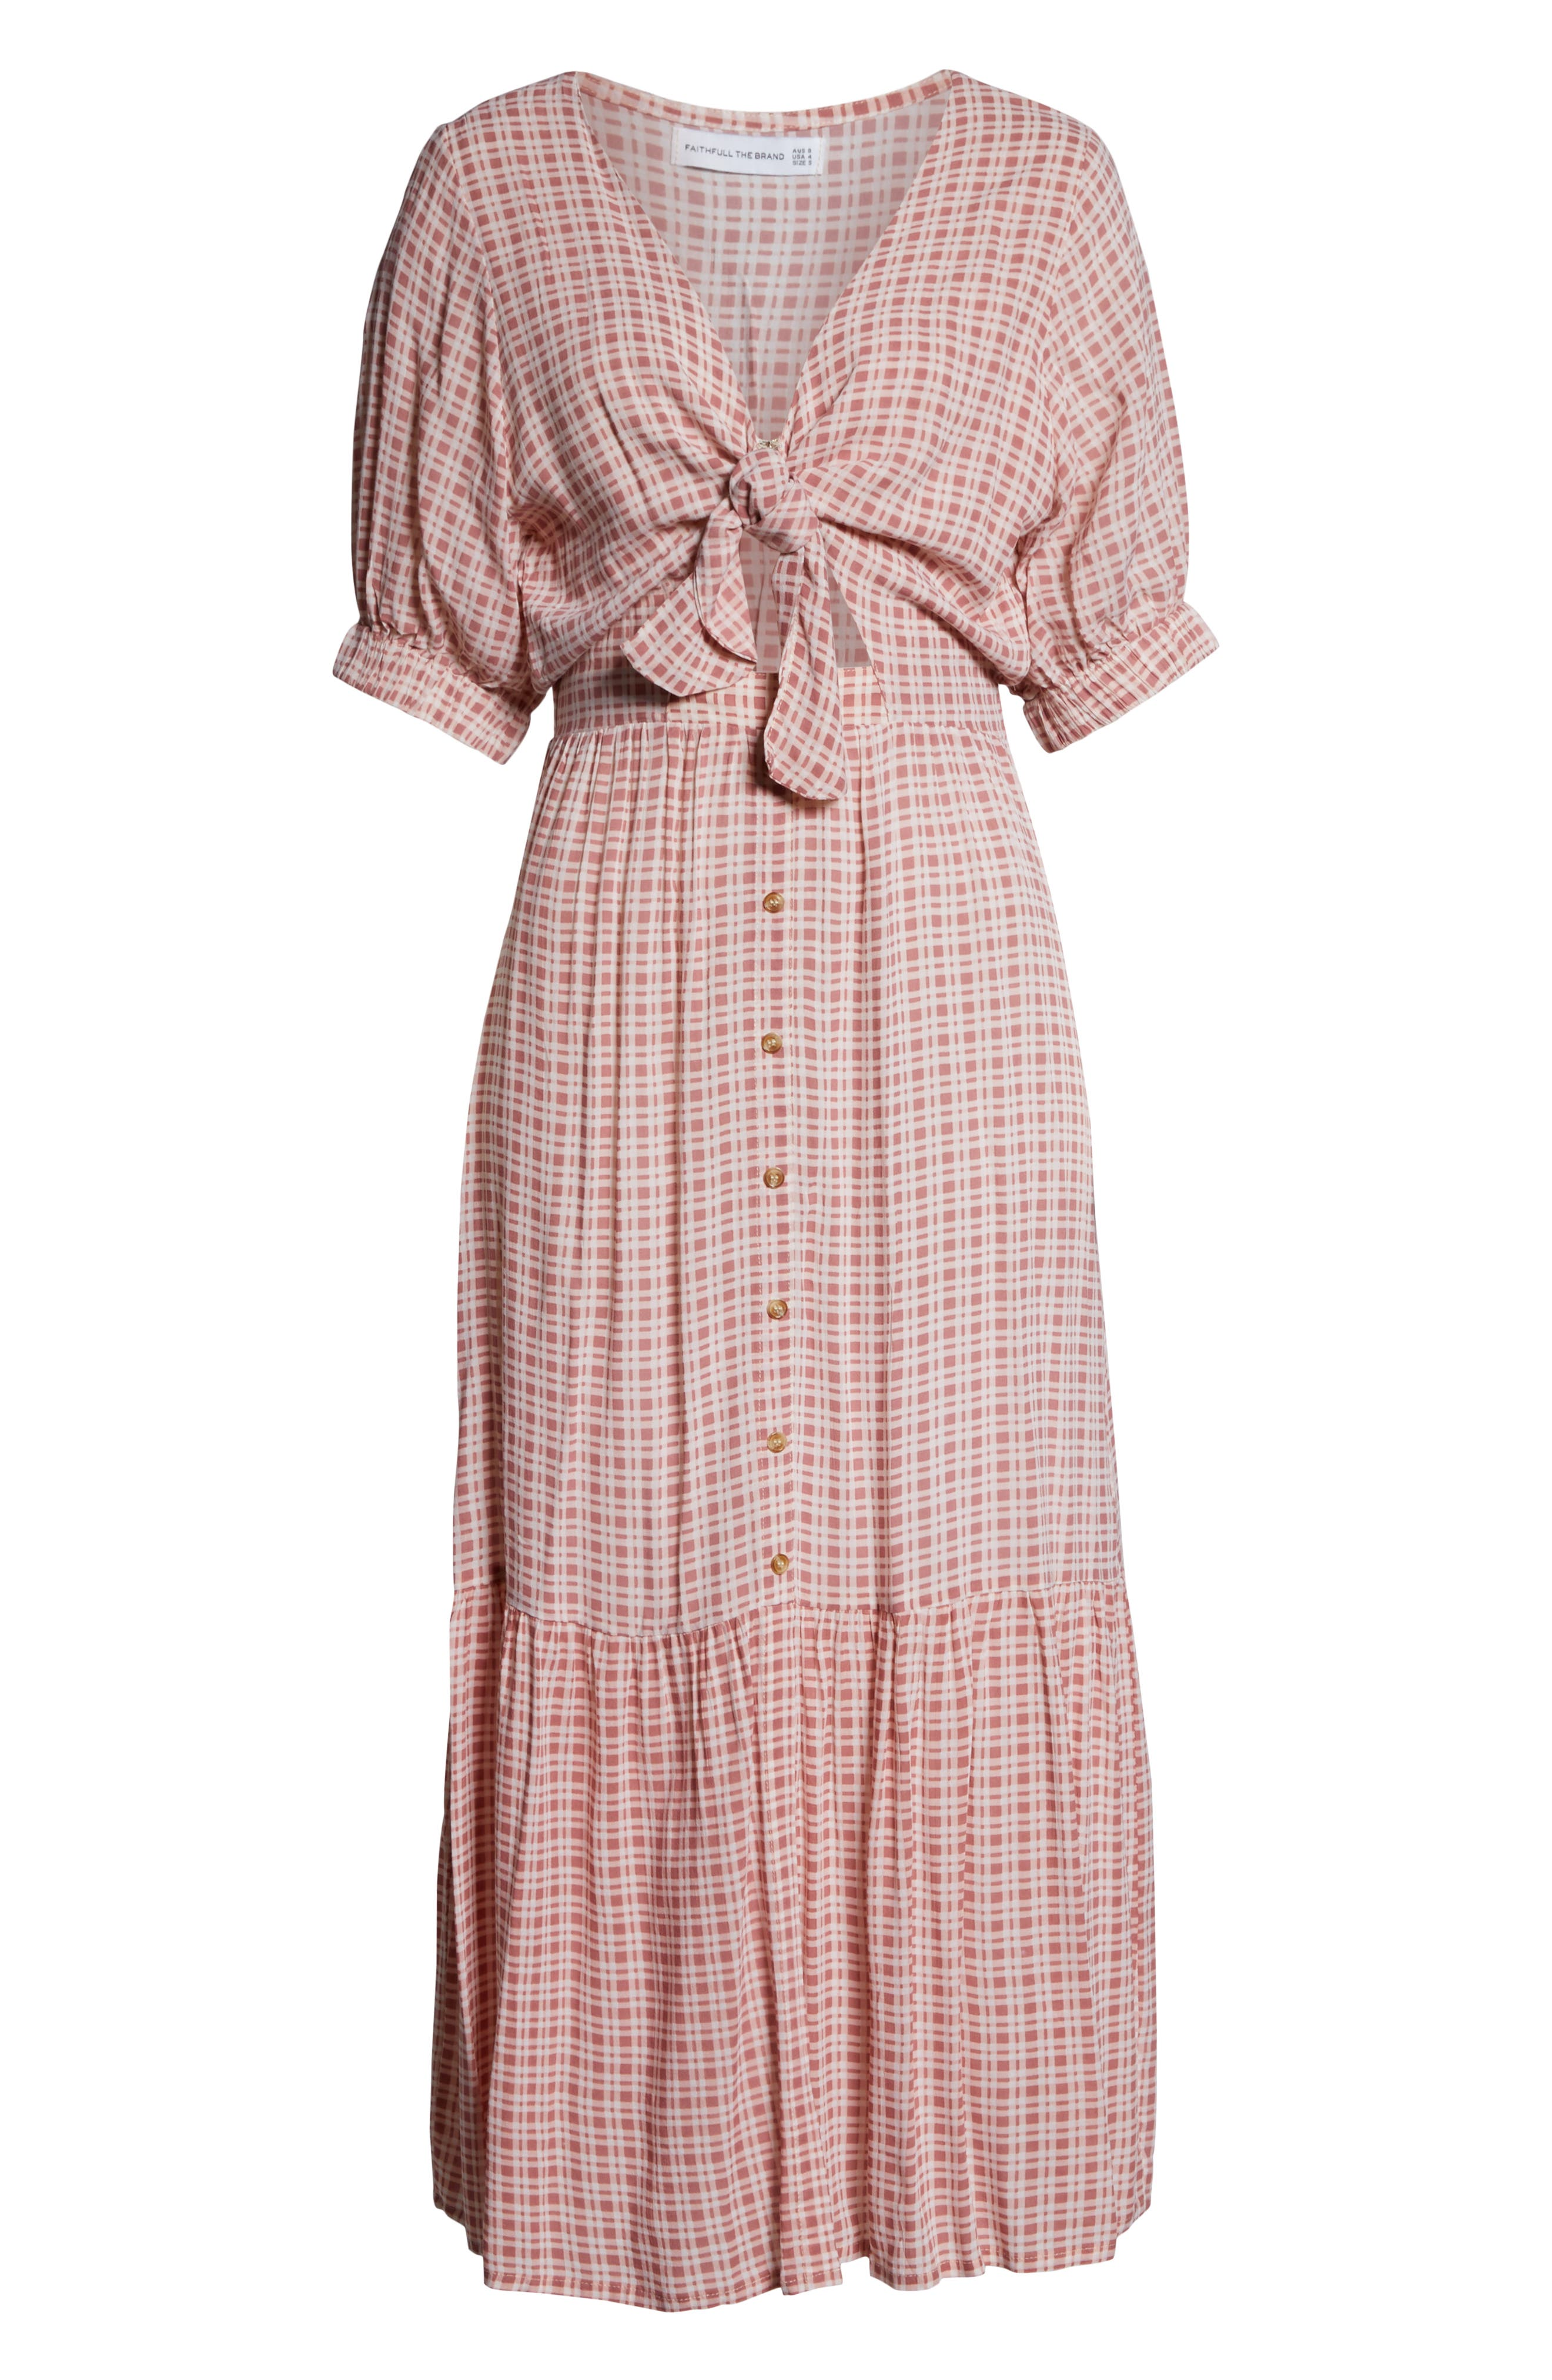 FAITHFULL THE BRAND,                             Maple Midi Dress,                             Alternate thumbnail 5, color,                             EMILINAH CHECK PRINT